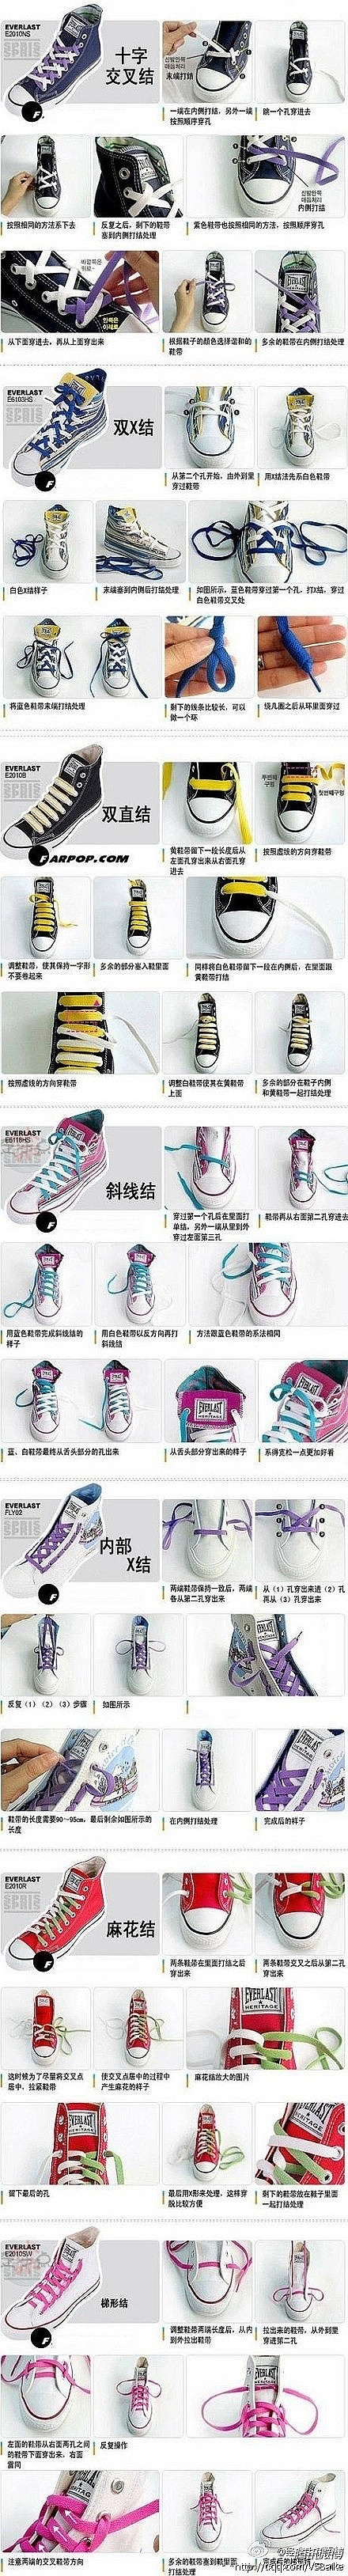 Converse clipart shoelace I it Wish Shoelace but